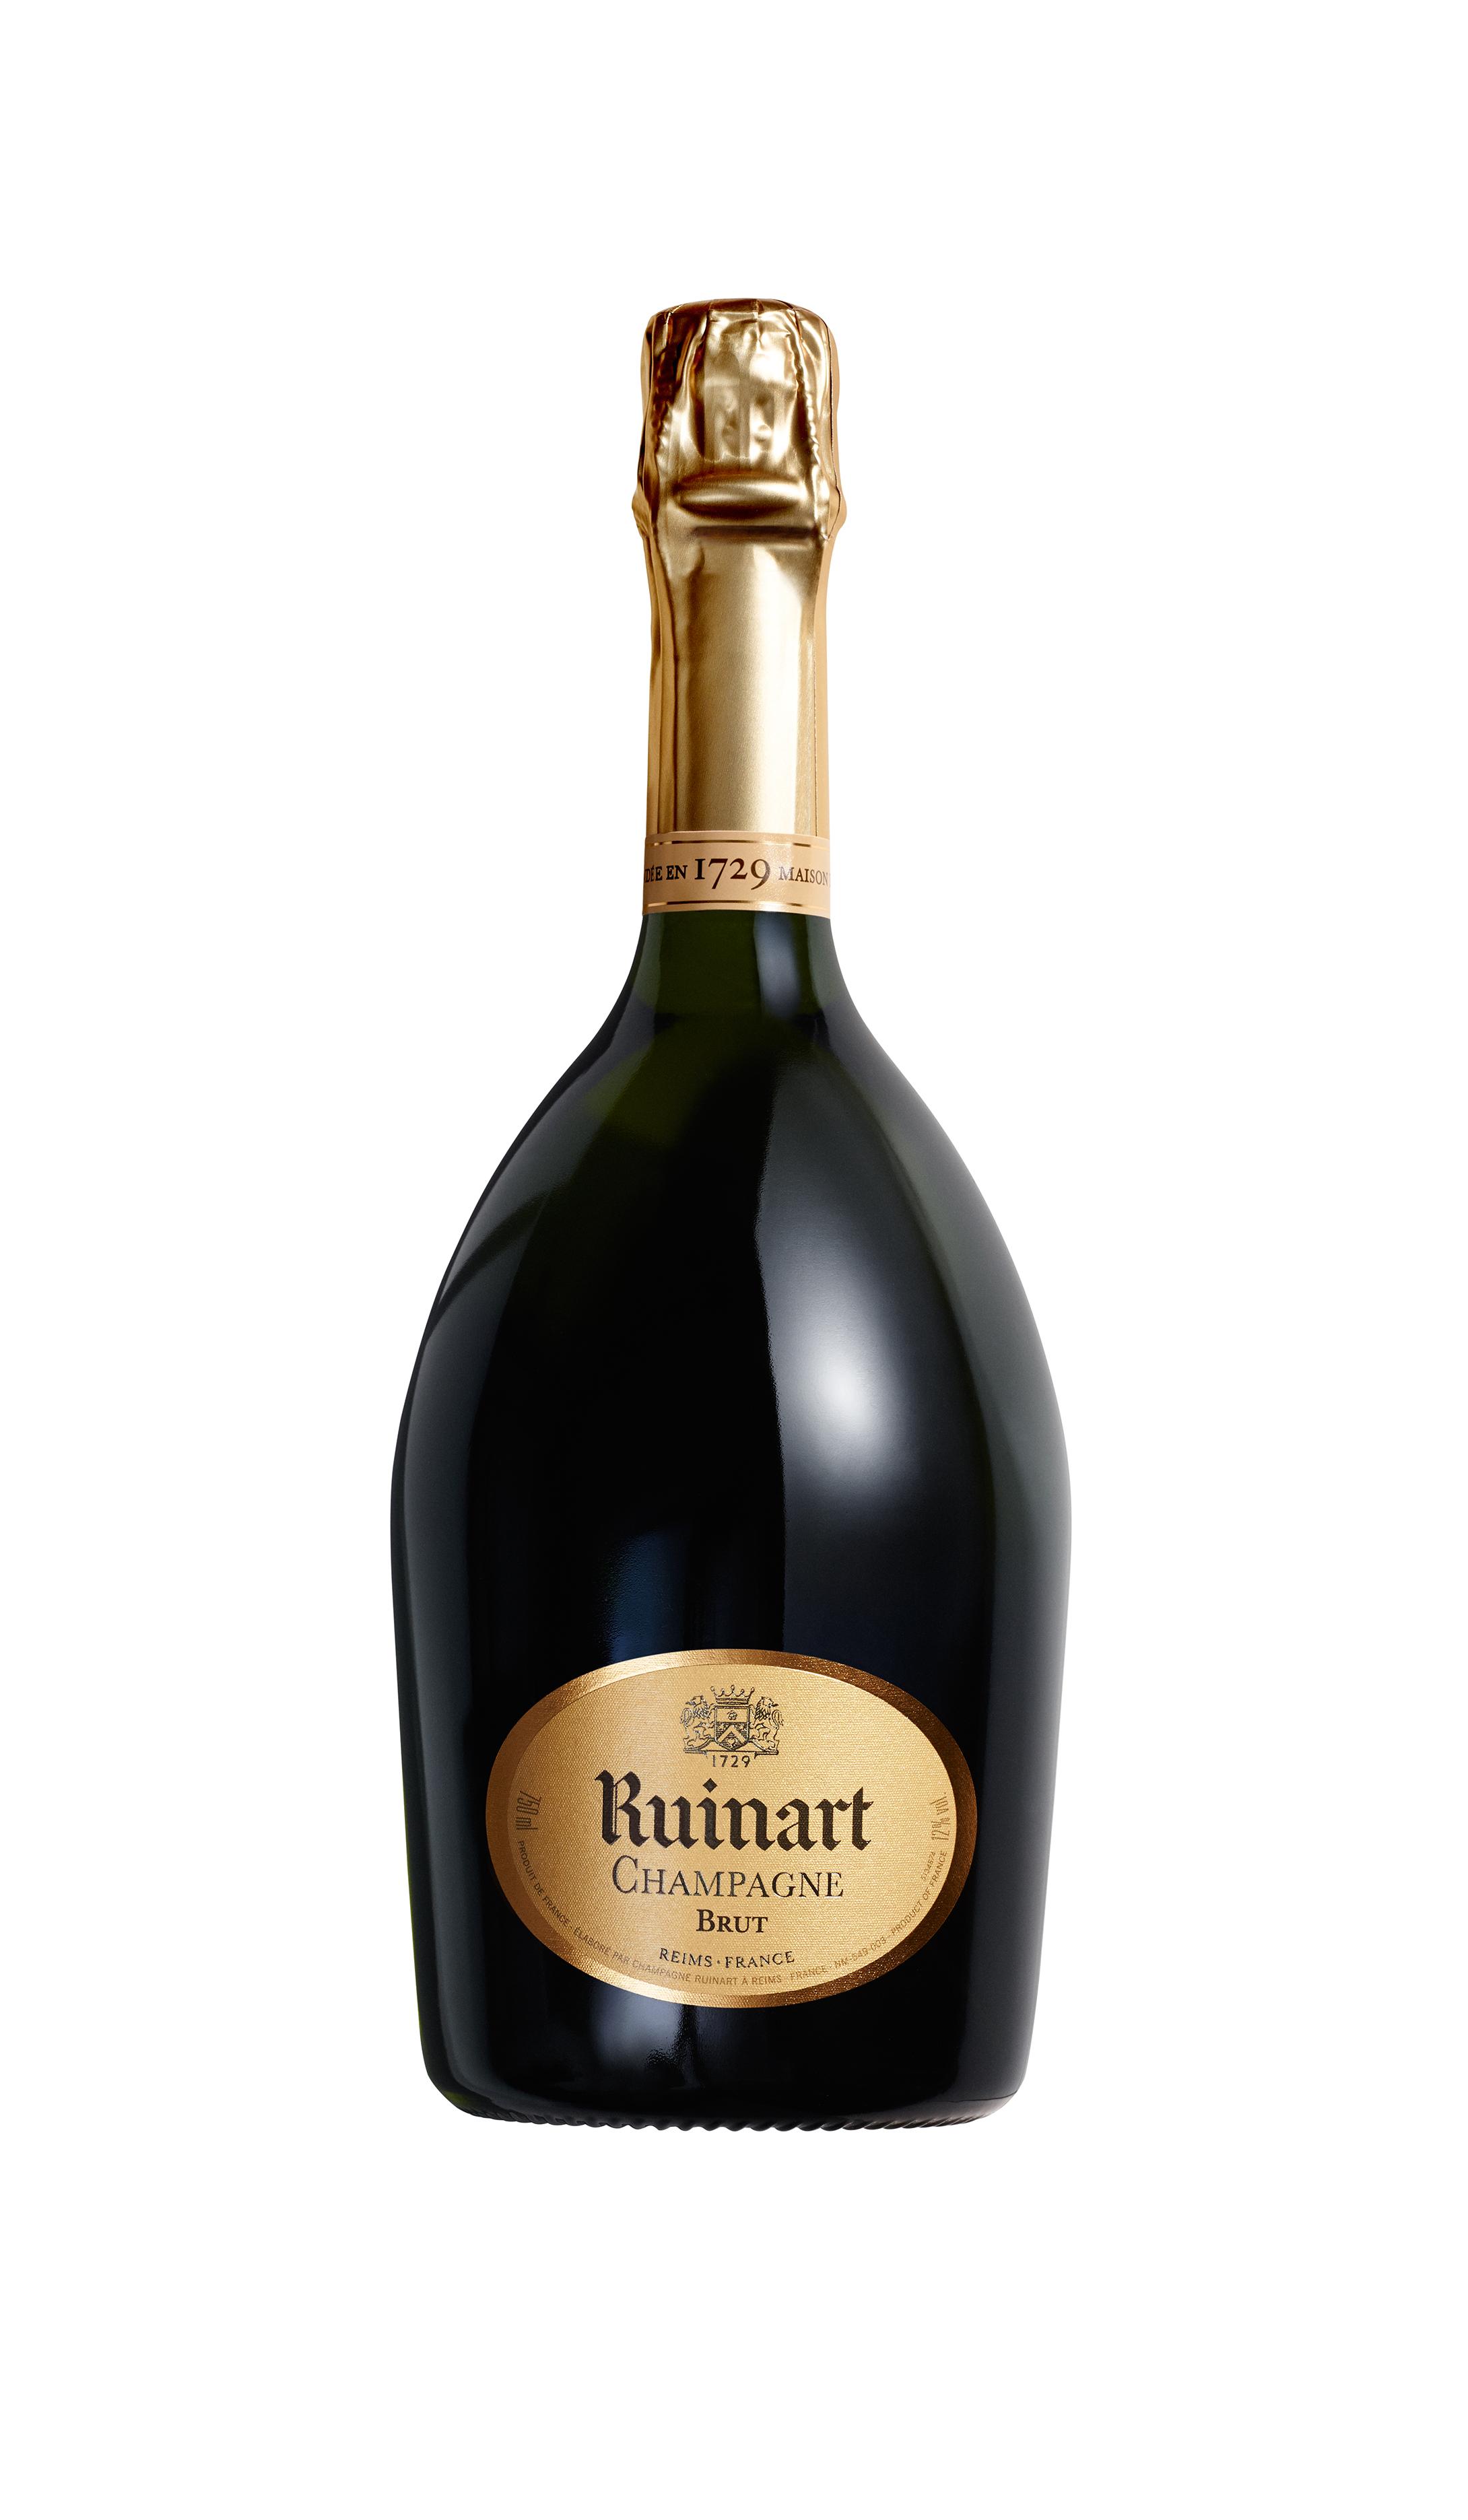 Champagner R de Ruinart brut 375ml